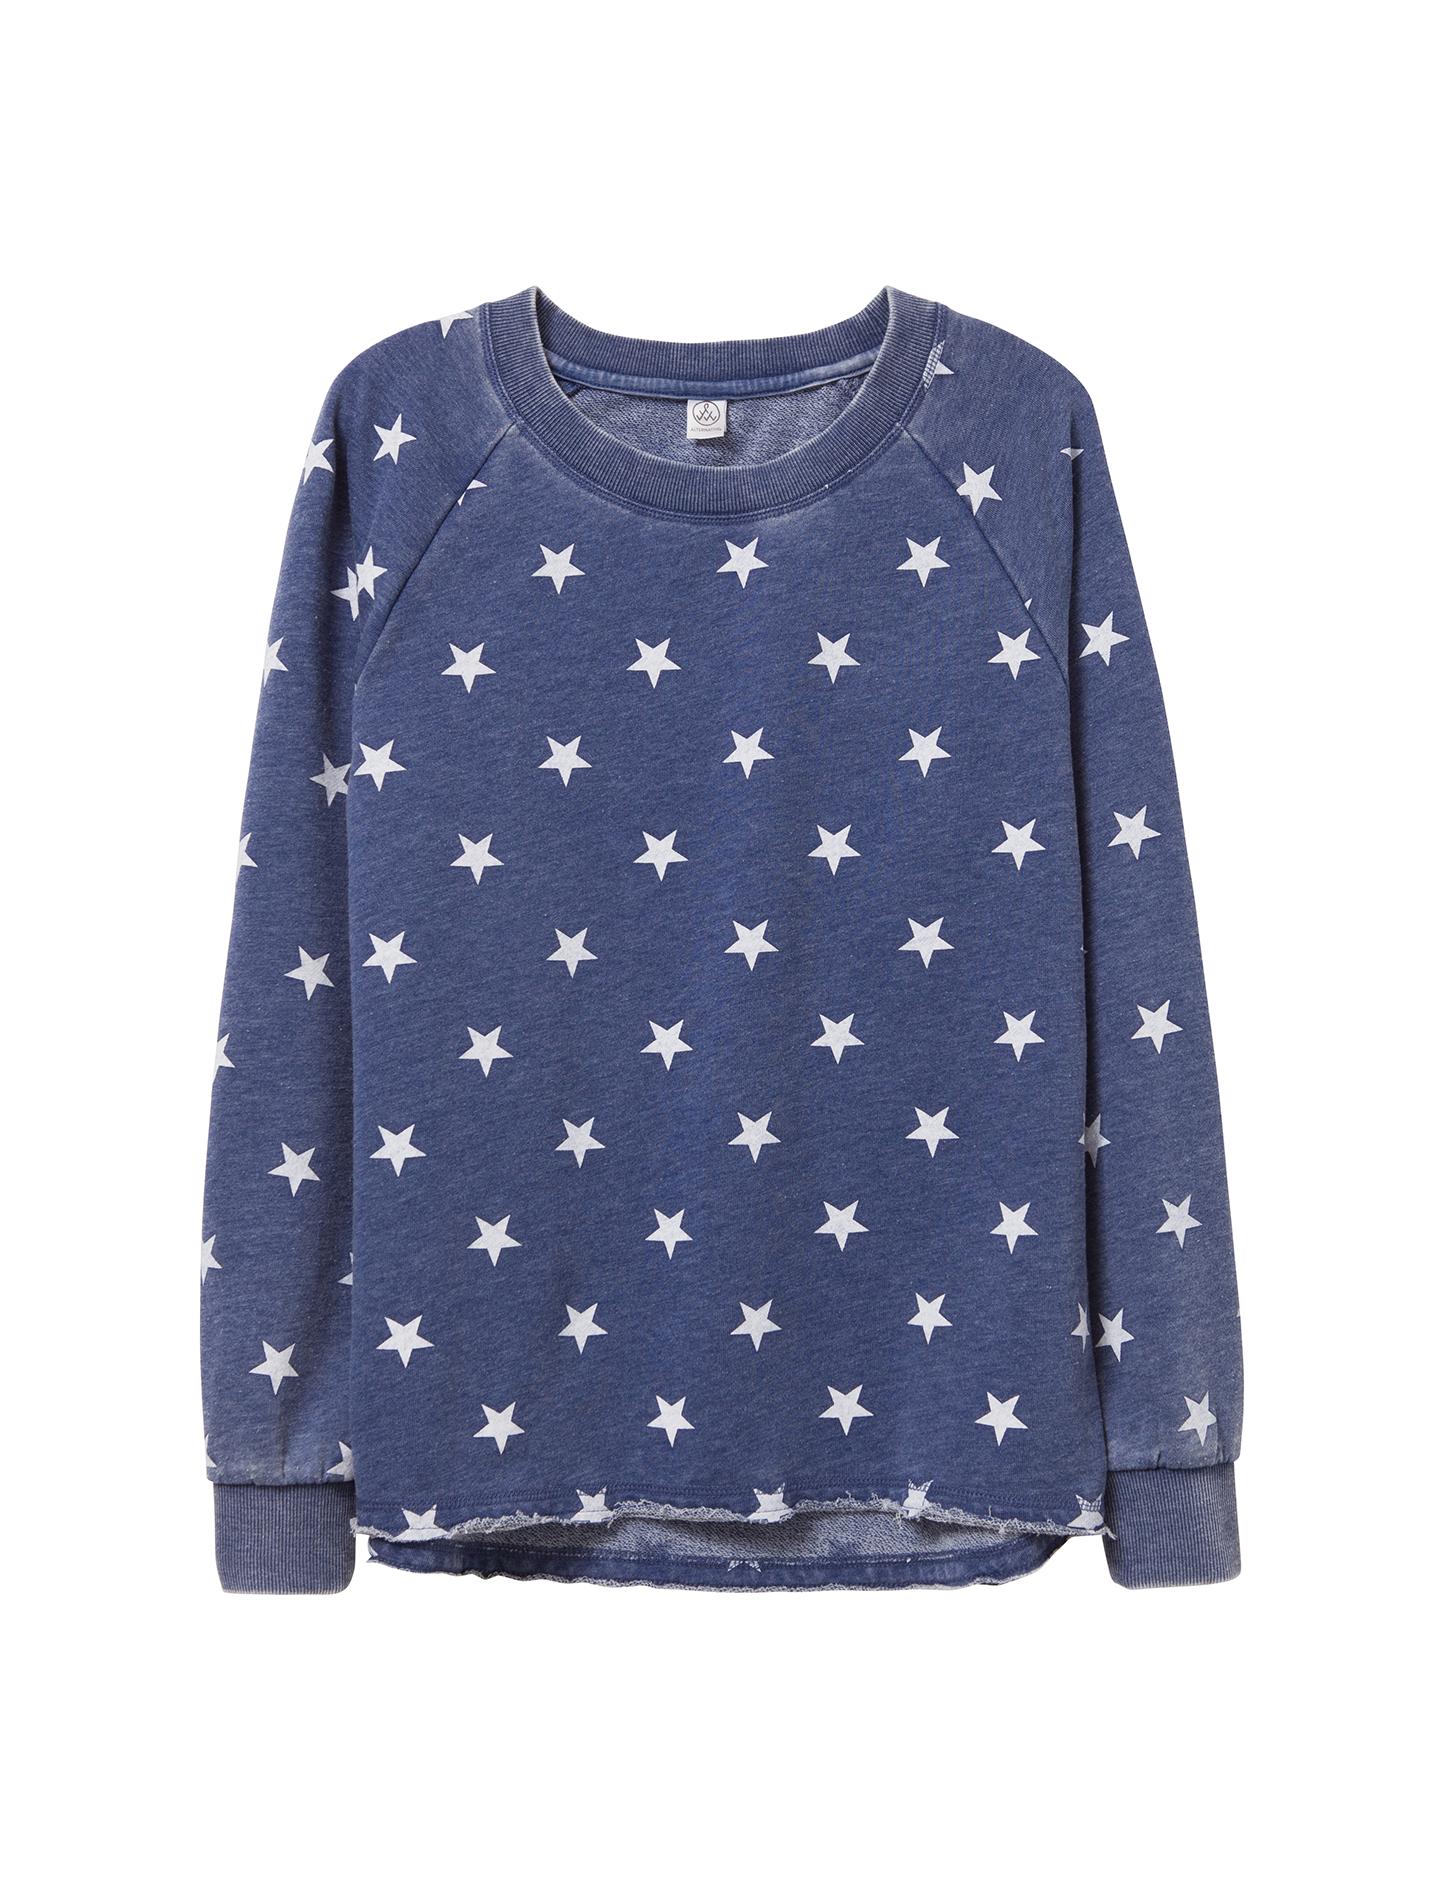 Alternative,Women,Lazy Day Pullover,Navy Stars,08626FJ